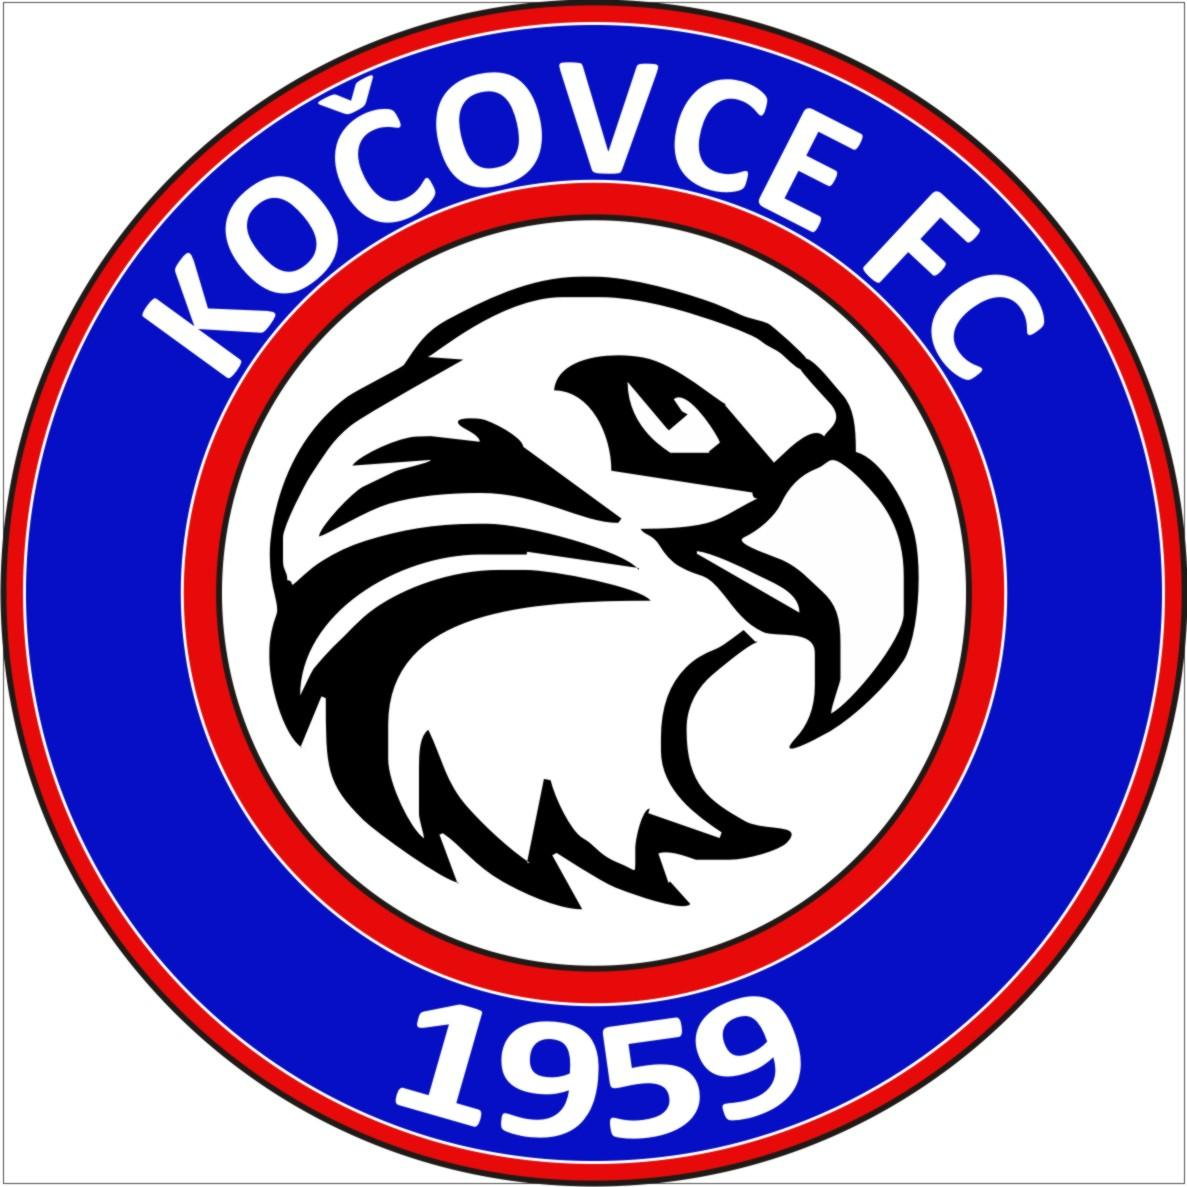 Kočovce FC 1959